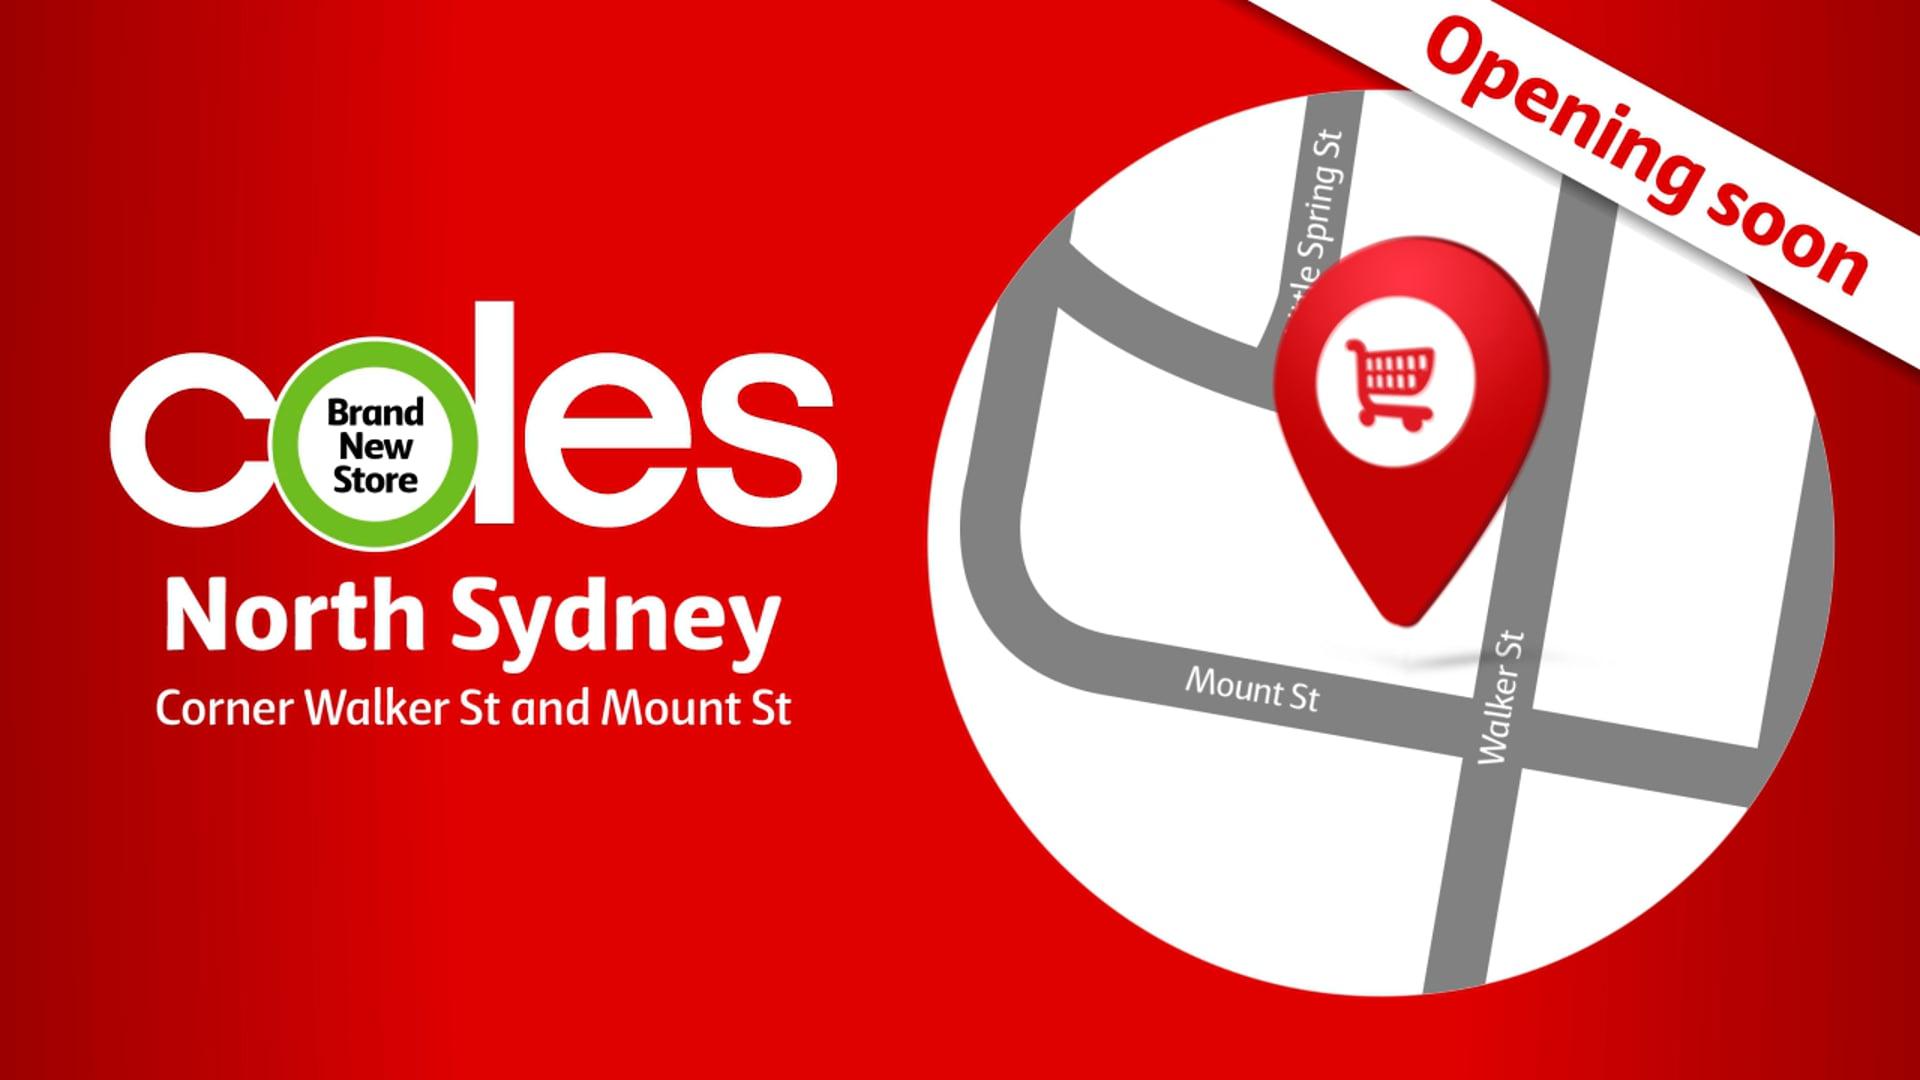 Coles North Sydney